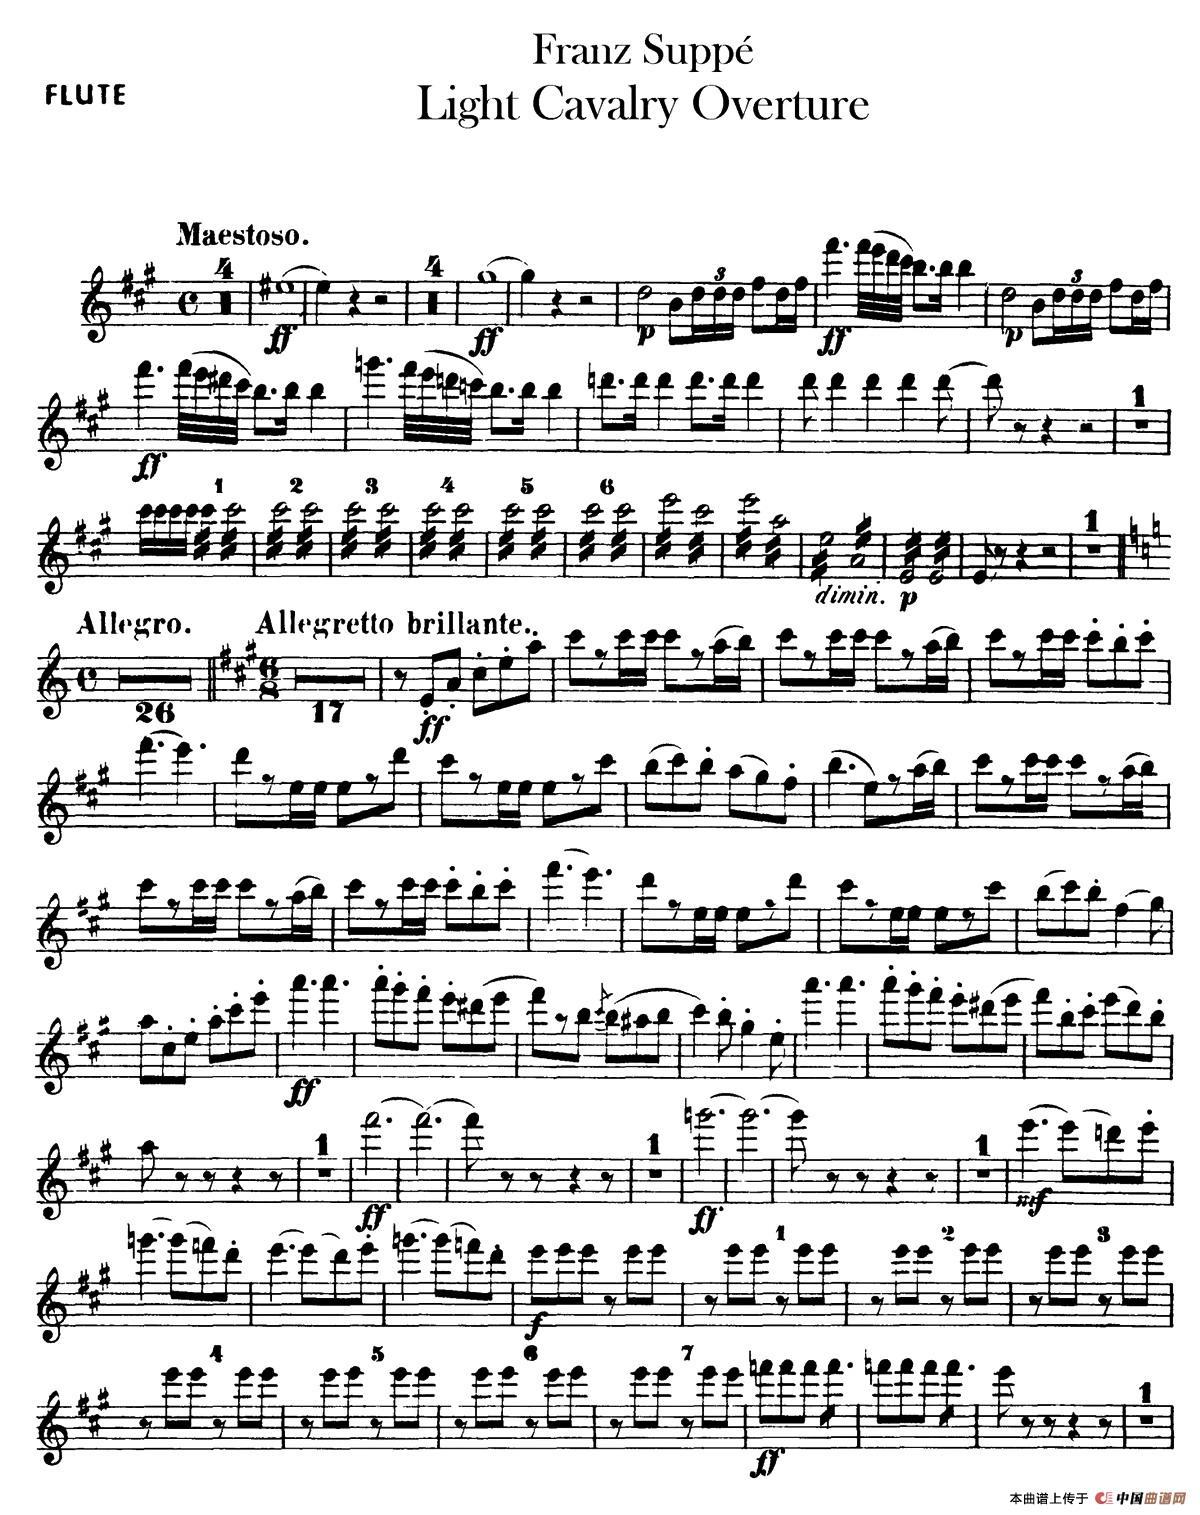 light cavalry overture(轻骑兵序曲)(管乐合奏长笛分谱)